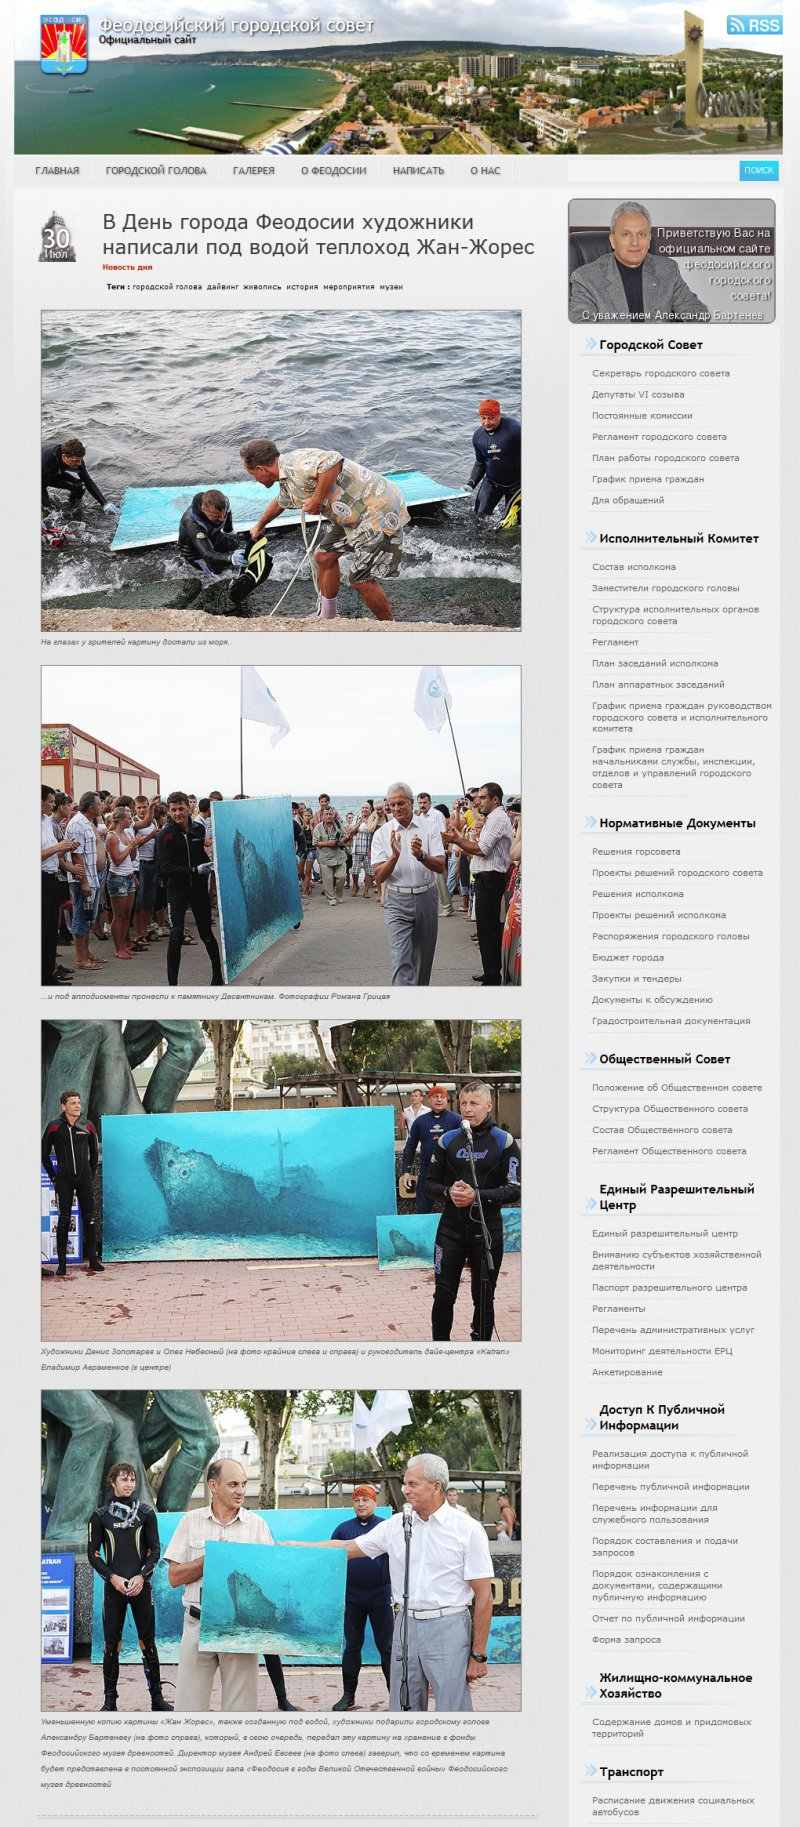 Сайт Феодосийского городского совета. В Феодосии художники написали под водой теплоход Жан-Жорес